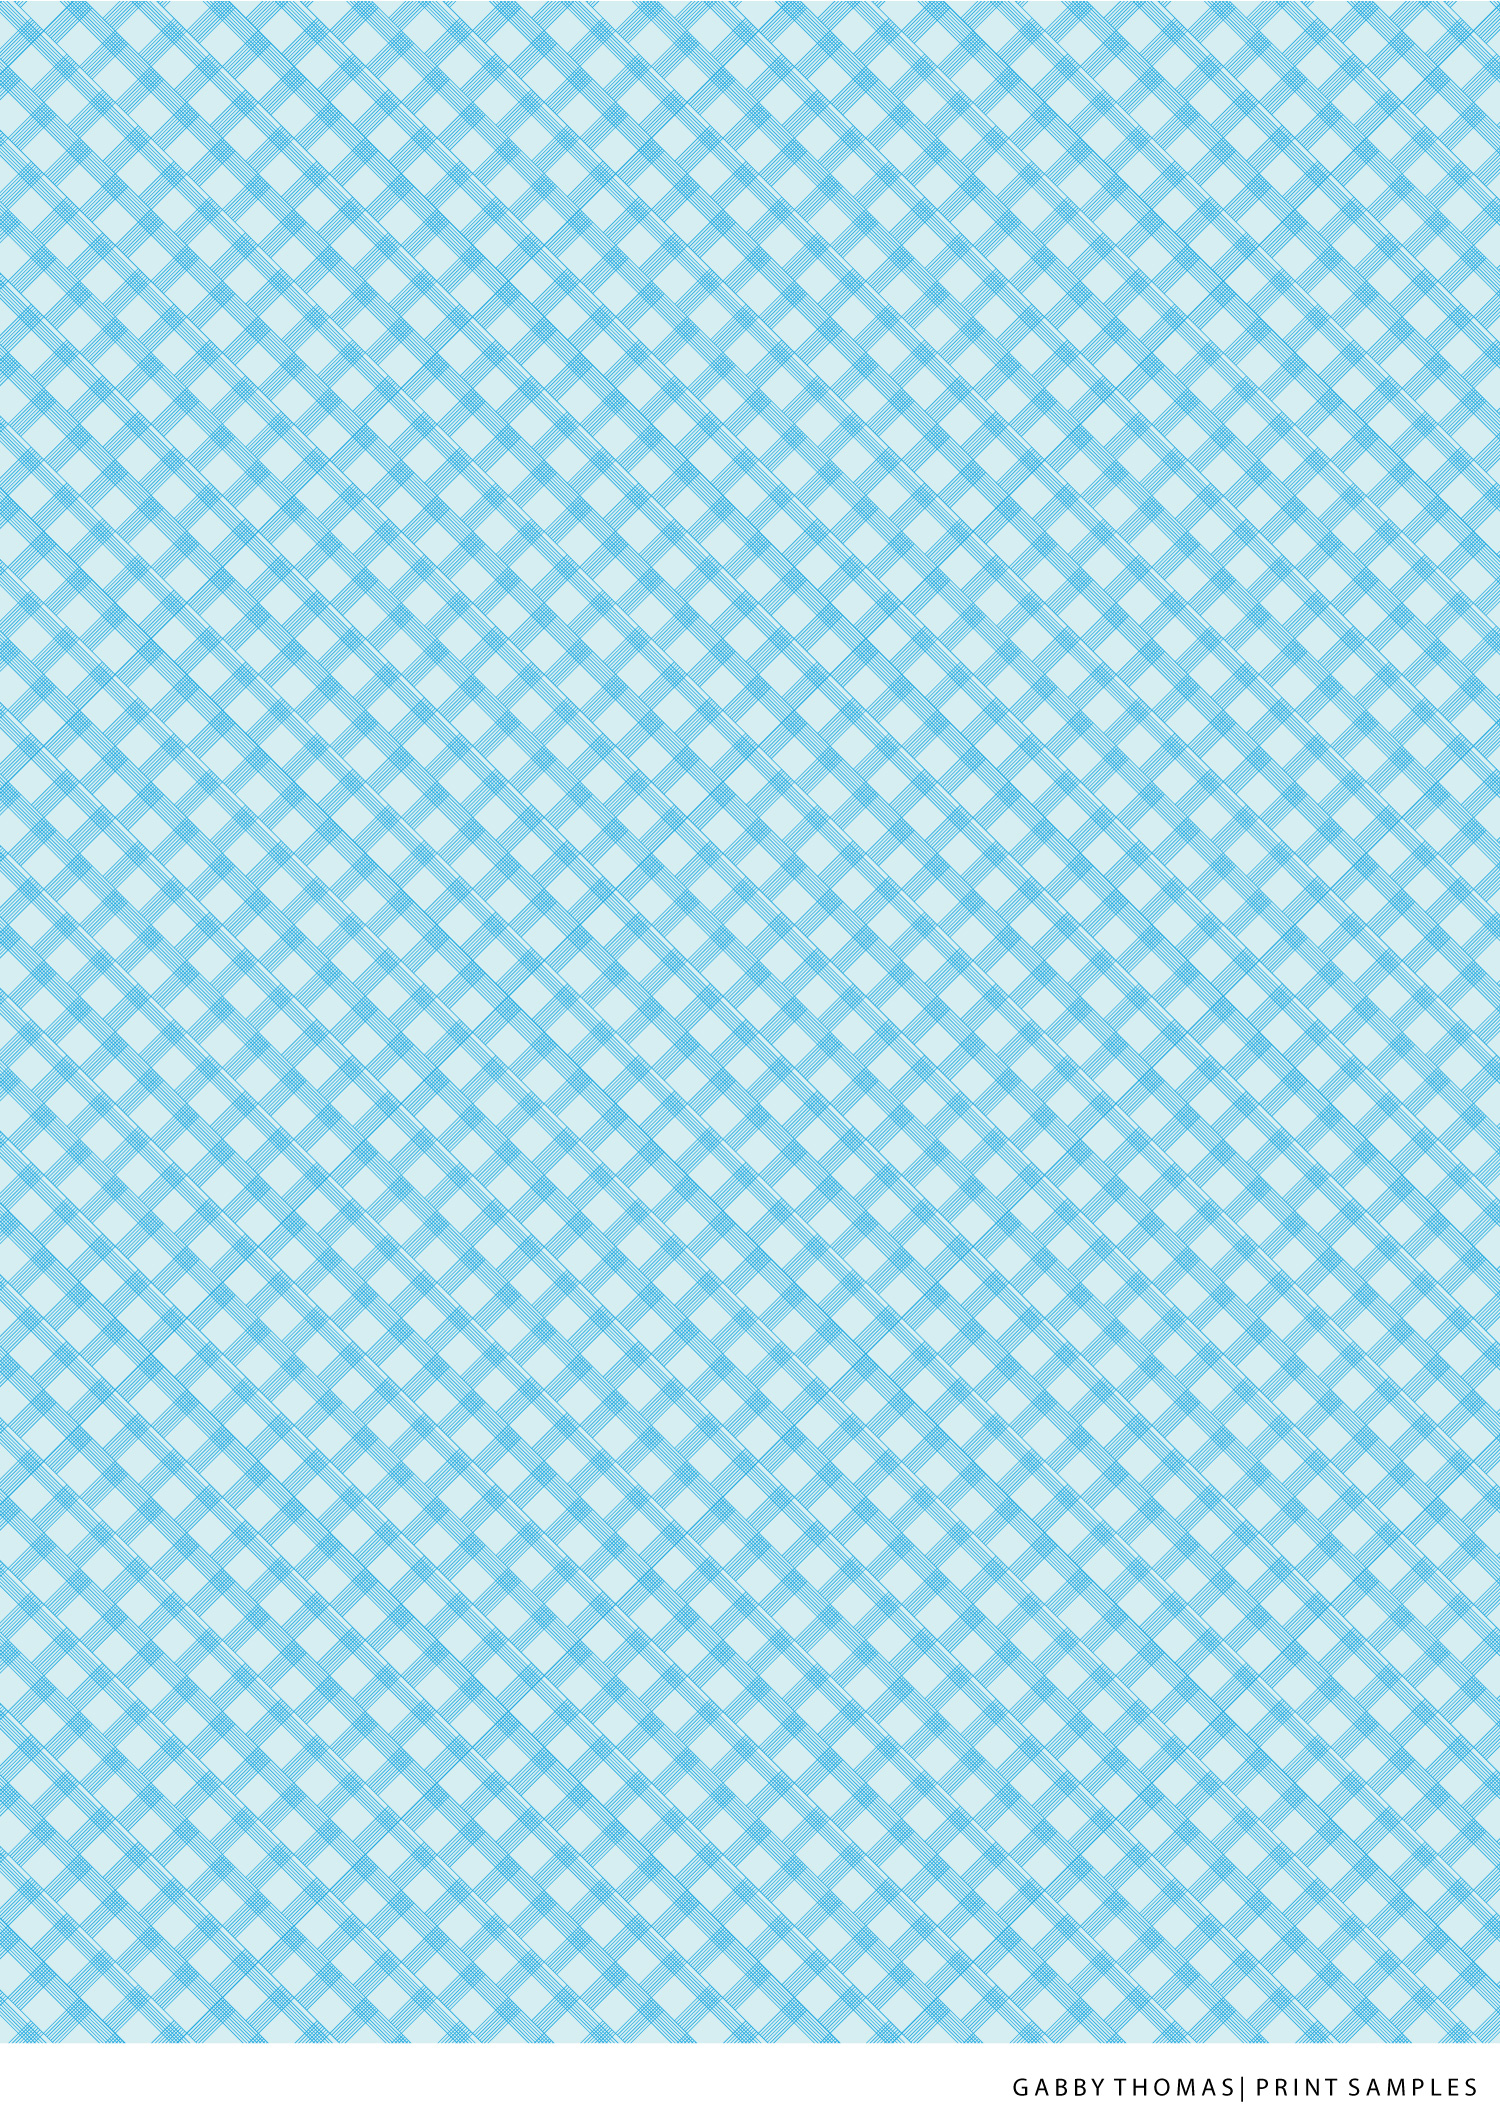 DIAGONAL-BLUE-CHECK.jpg